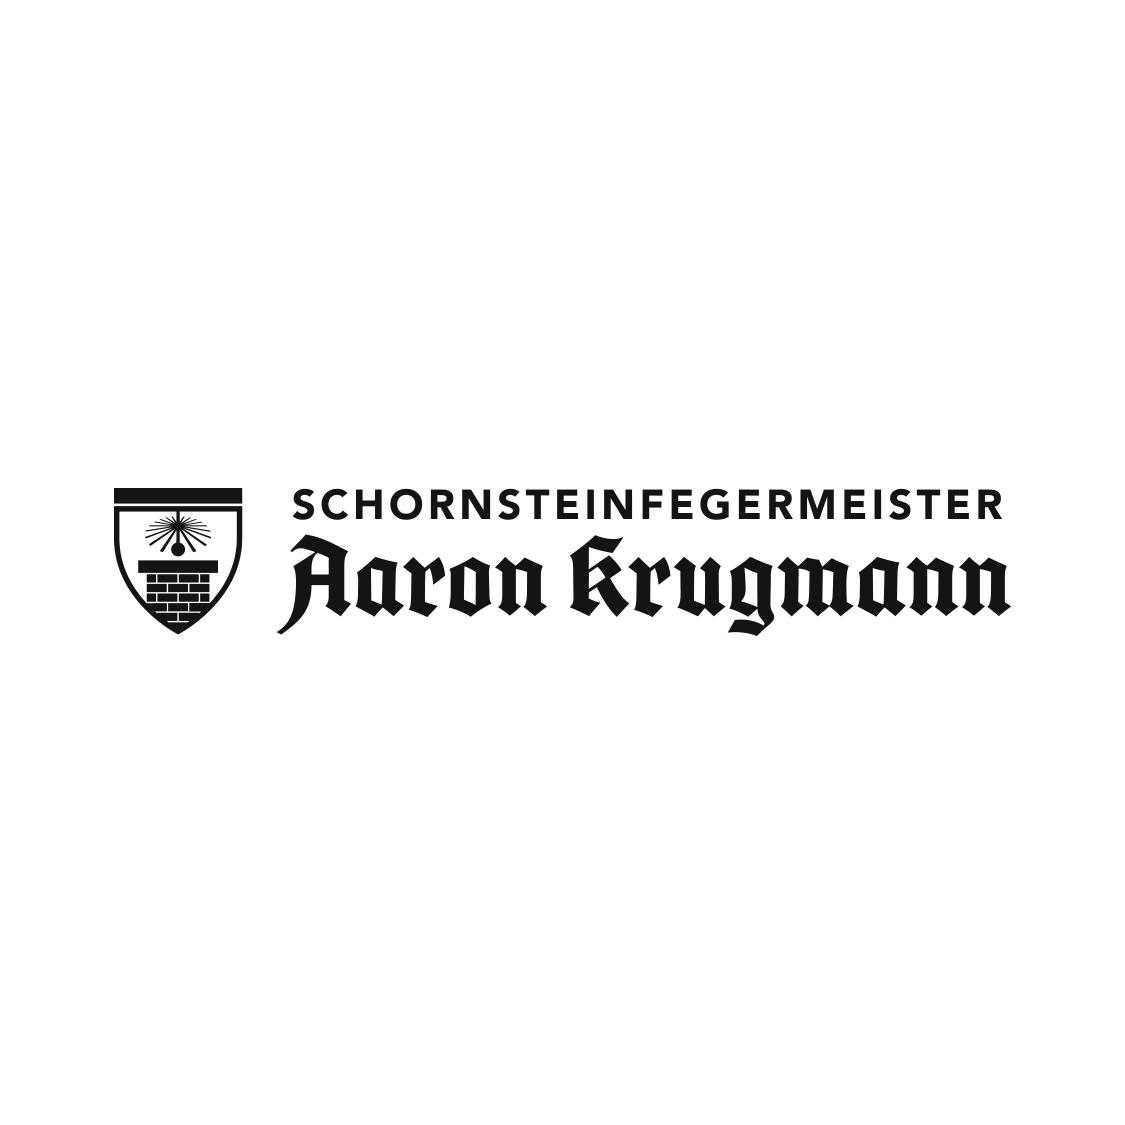 03 Logo Schornsteinfegermeister Aaron Krugmann